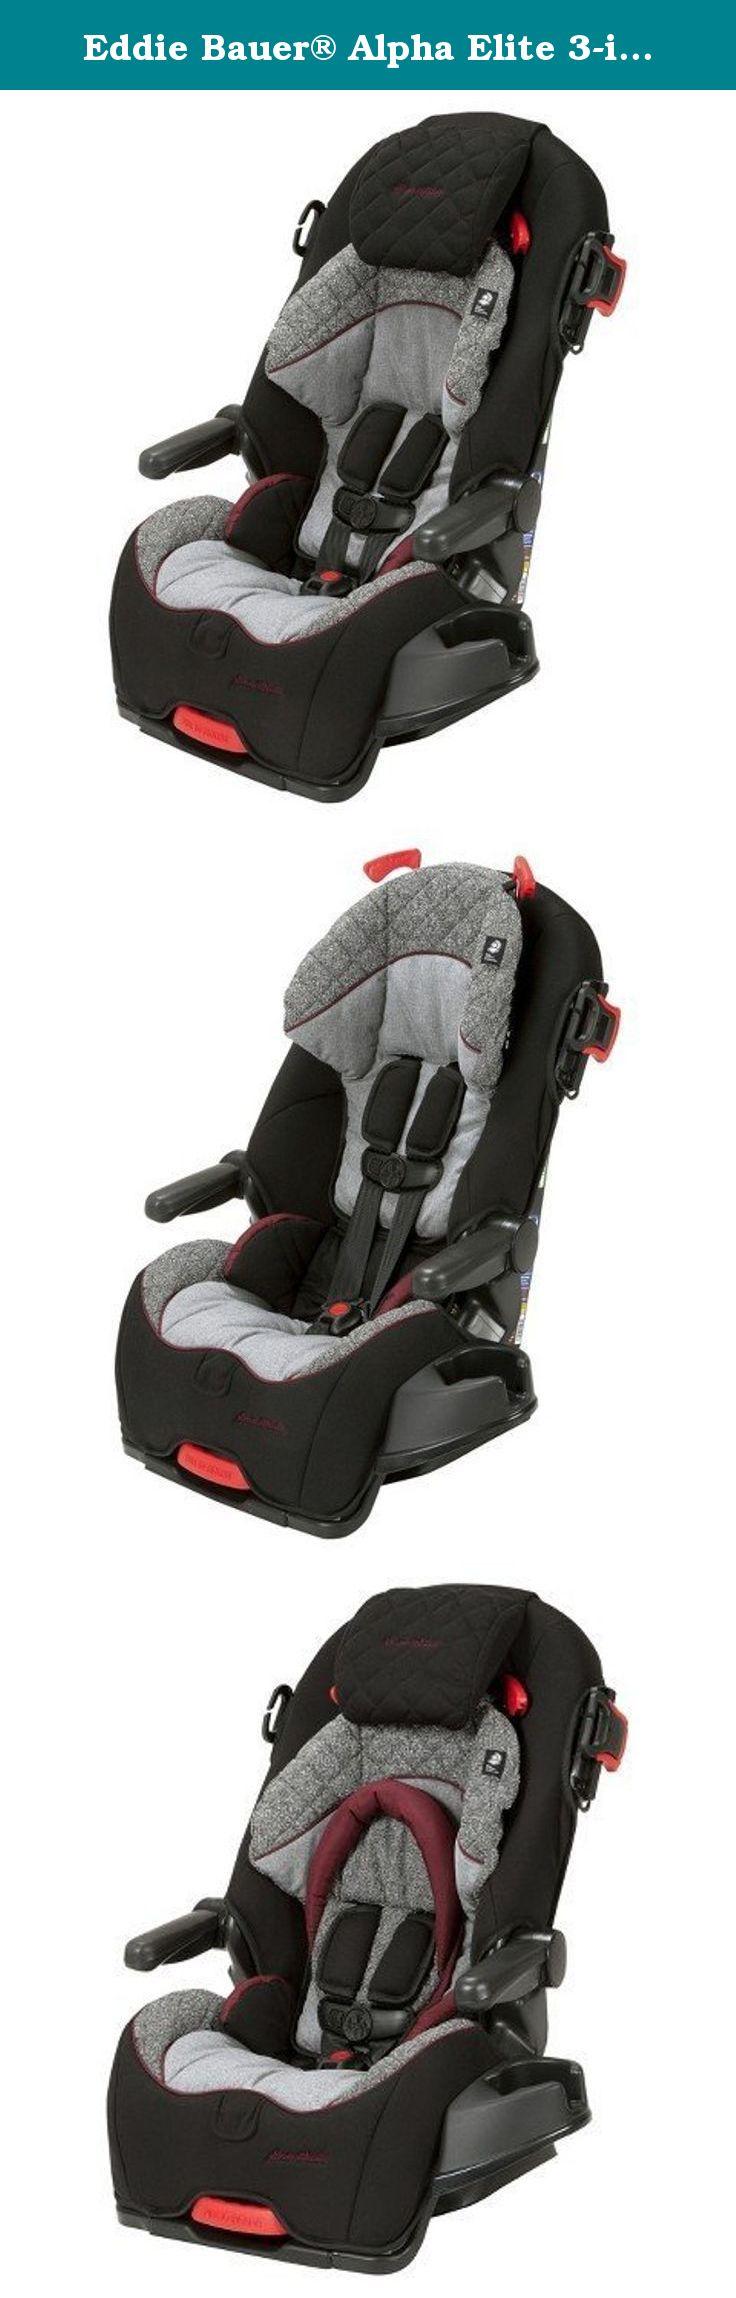 Ed Bauer® Alpha Elite 3-in-1 Convertible Car Seat - Gentry - Kids